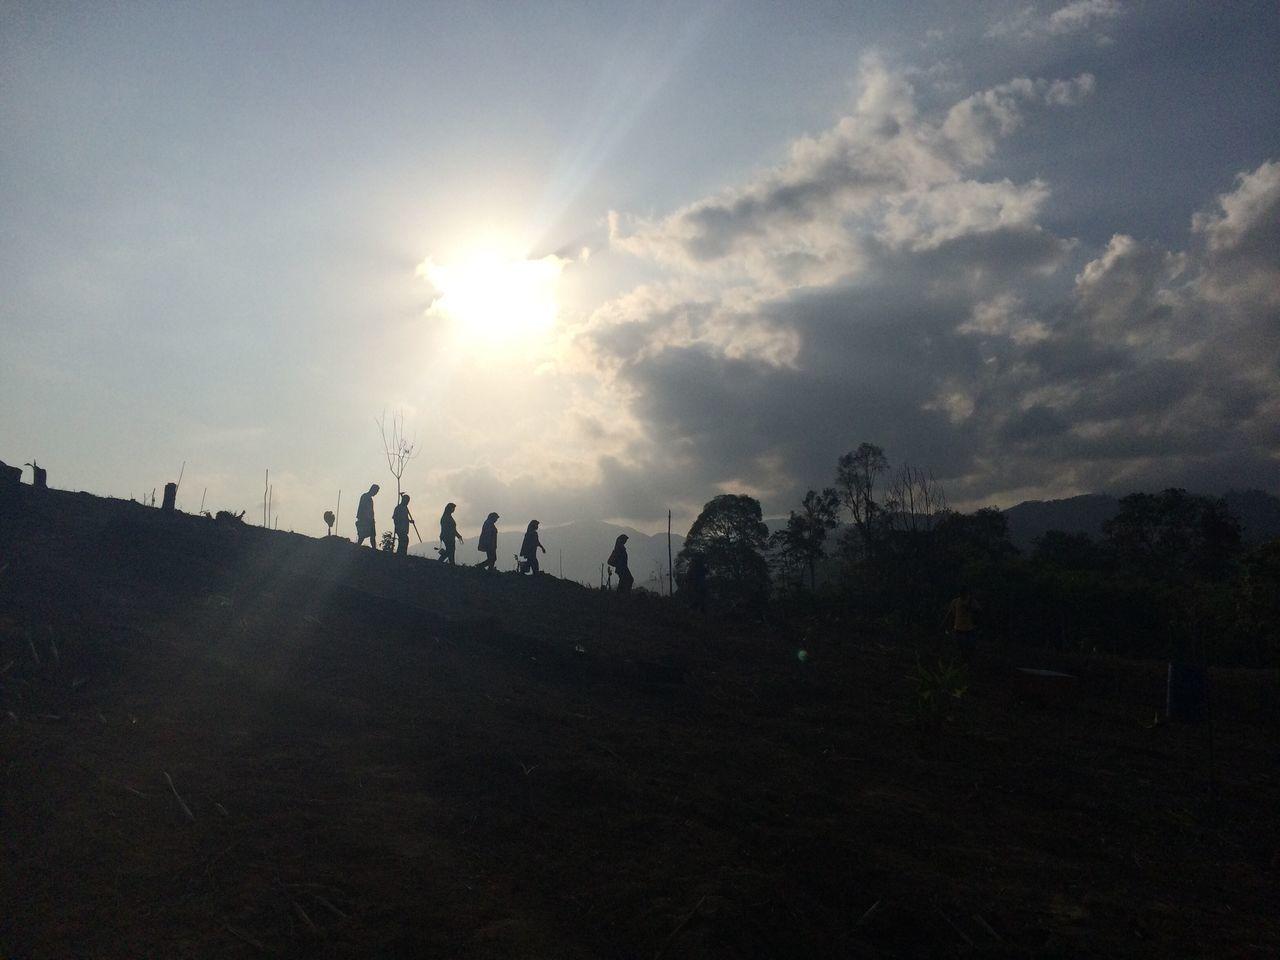 sky, silhouette, sun, sunset, nature, landscape, cloud - sky, sunlight, outdoors, men, day, beauty in nature, people